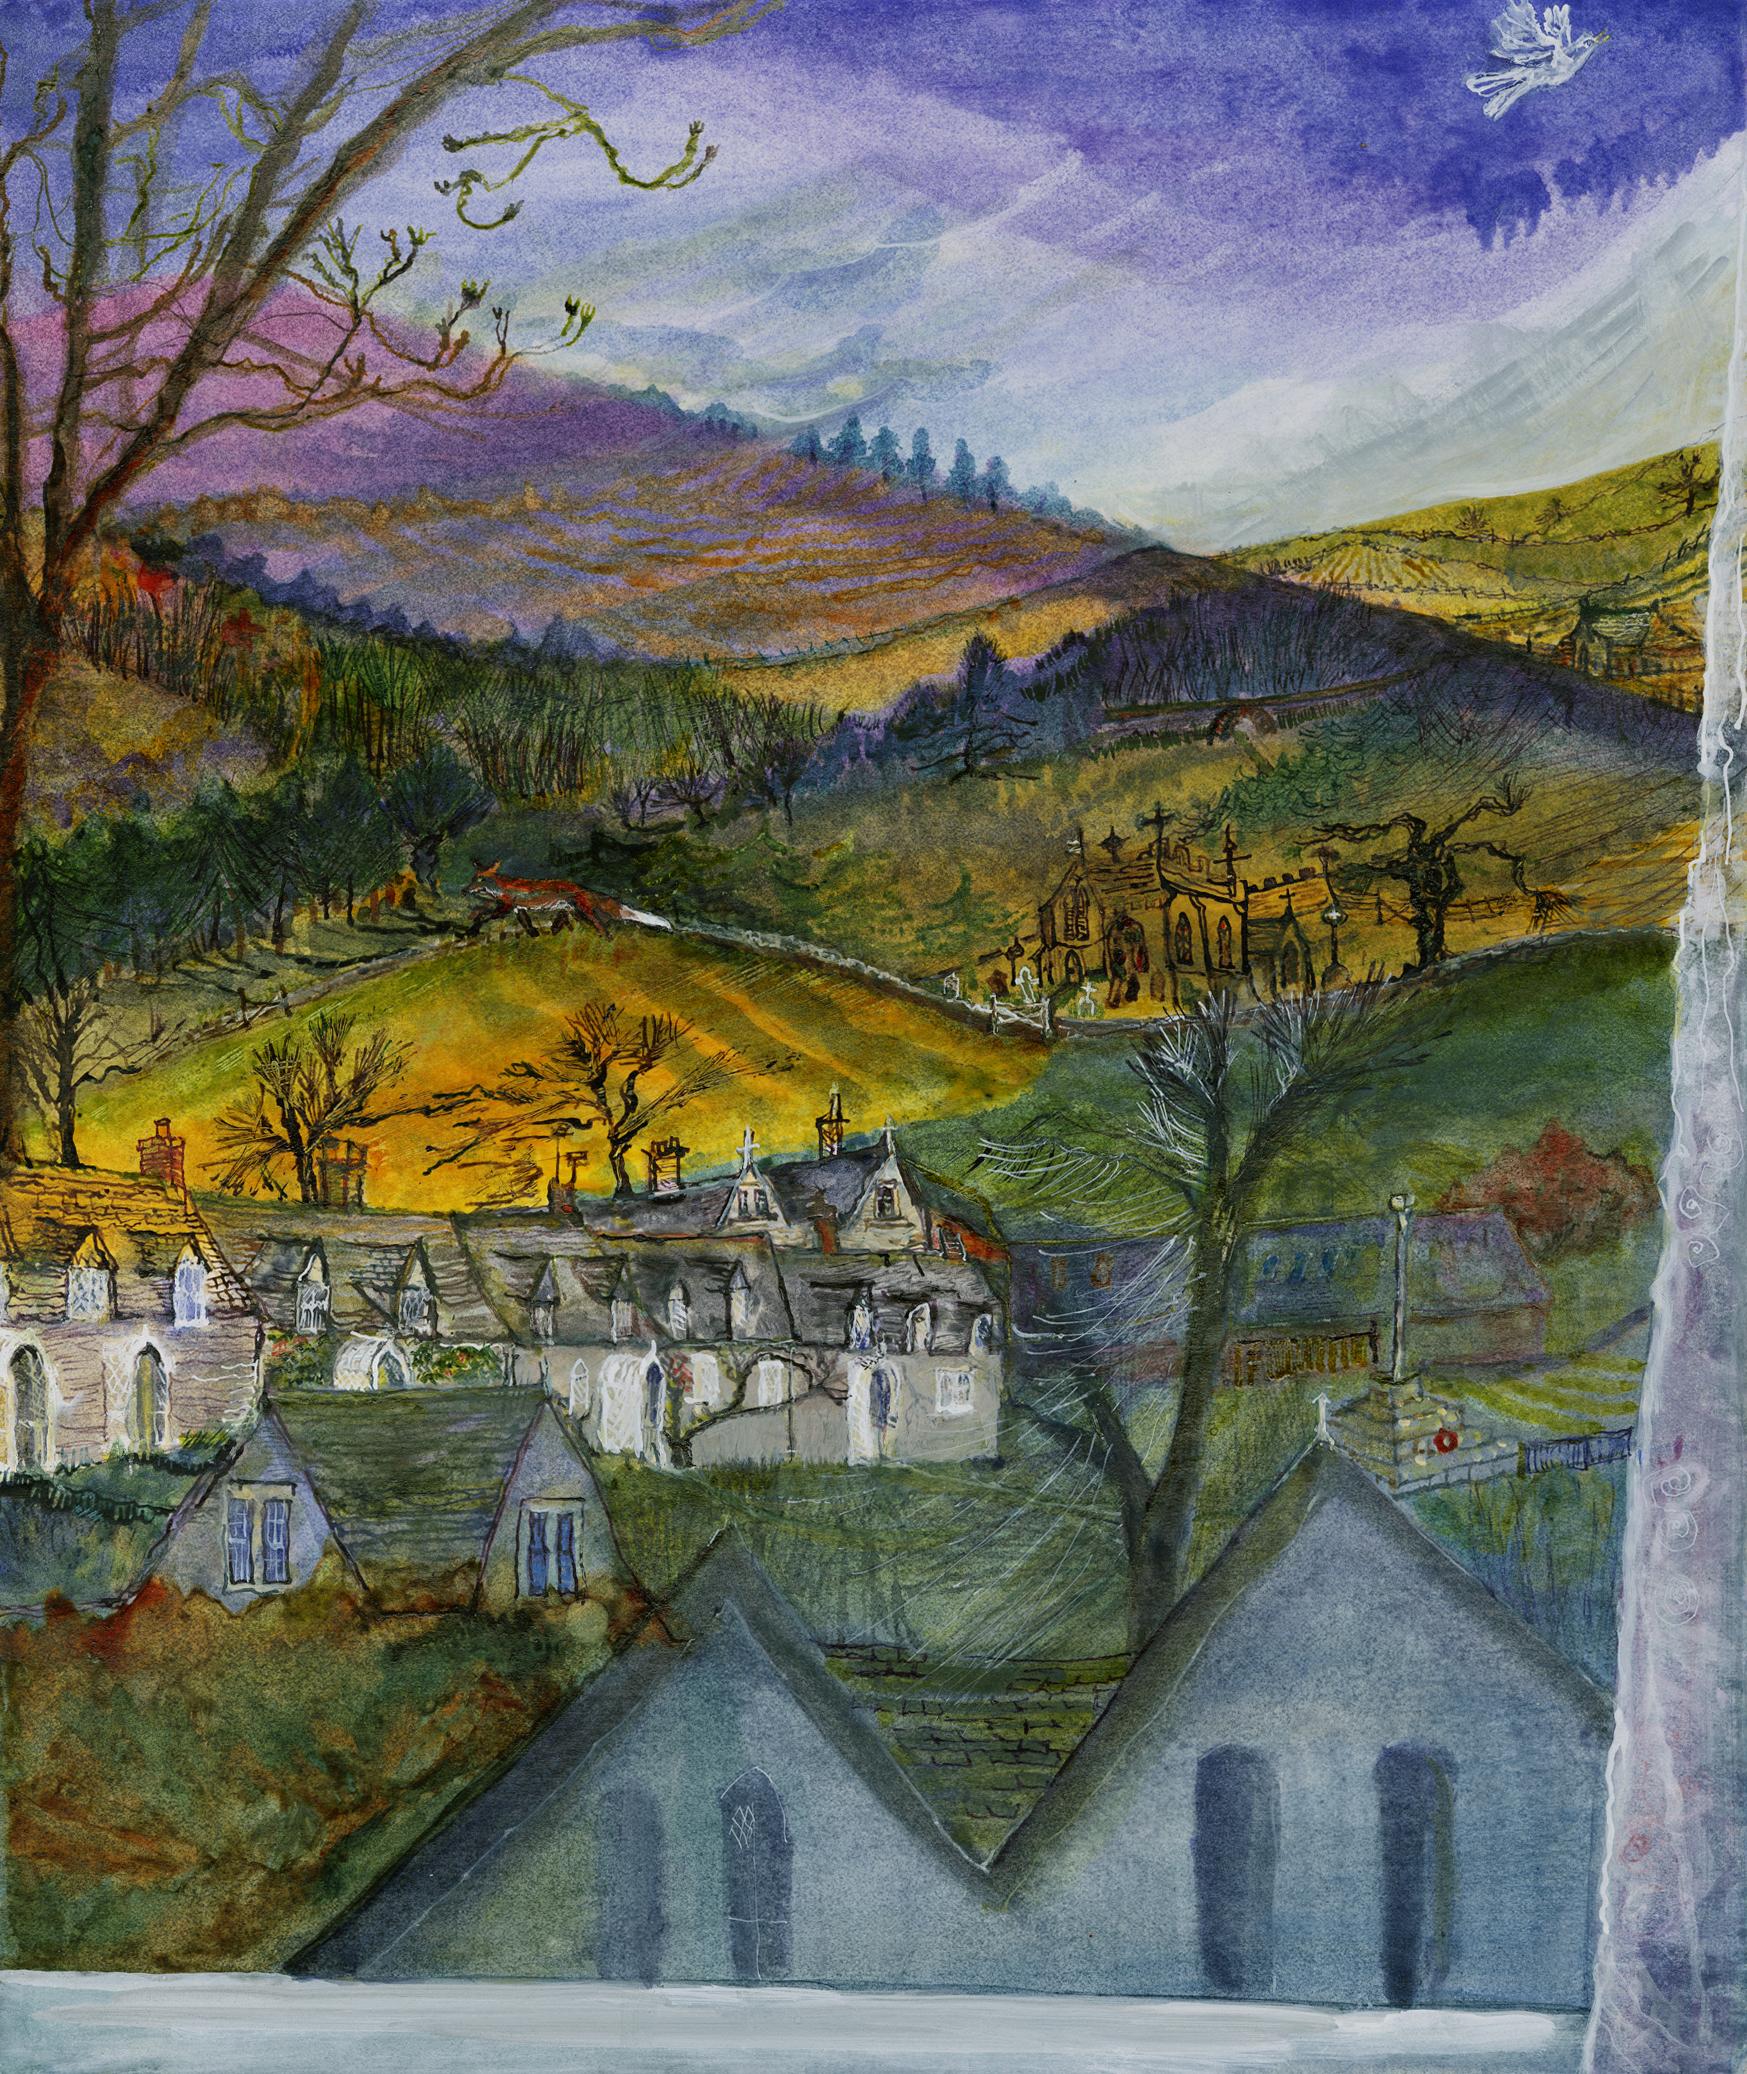 Evening lark singing above village